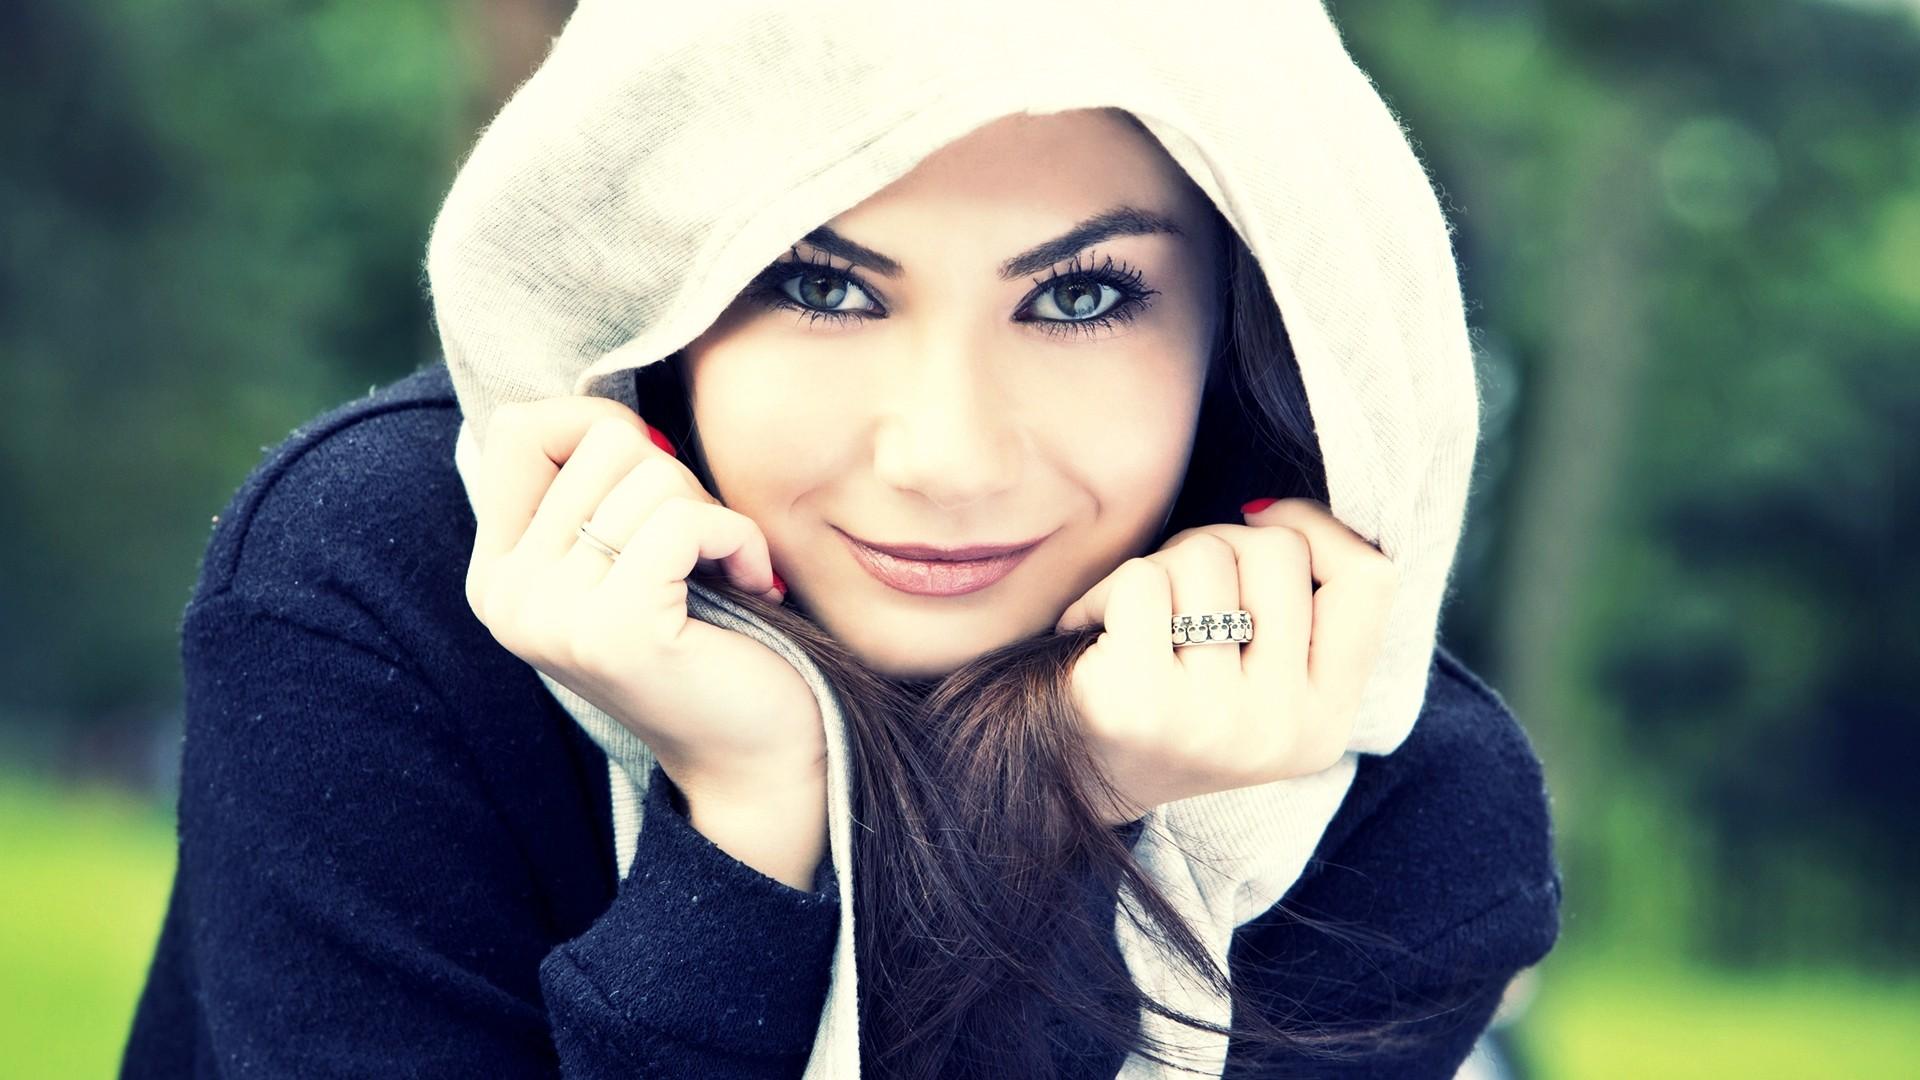 Cute-Smiling-Girl-Face-HD-1080p-Download-wallpaper-wp3604488